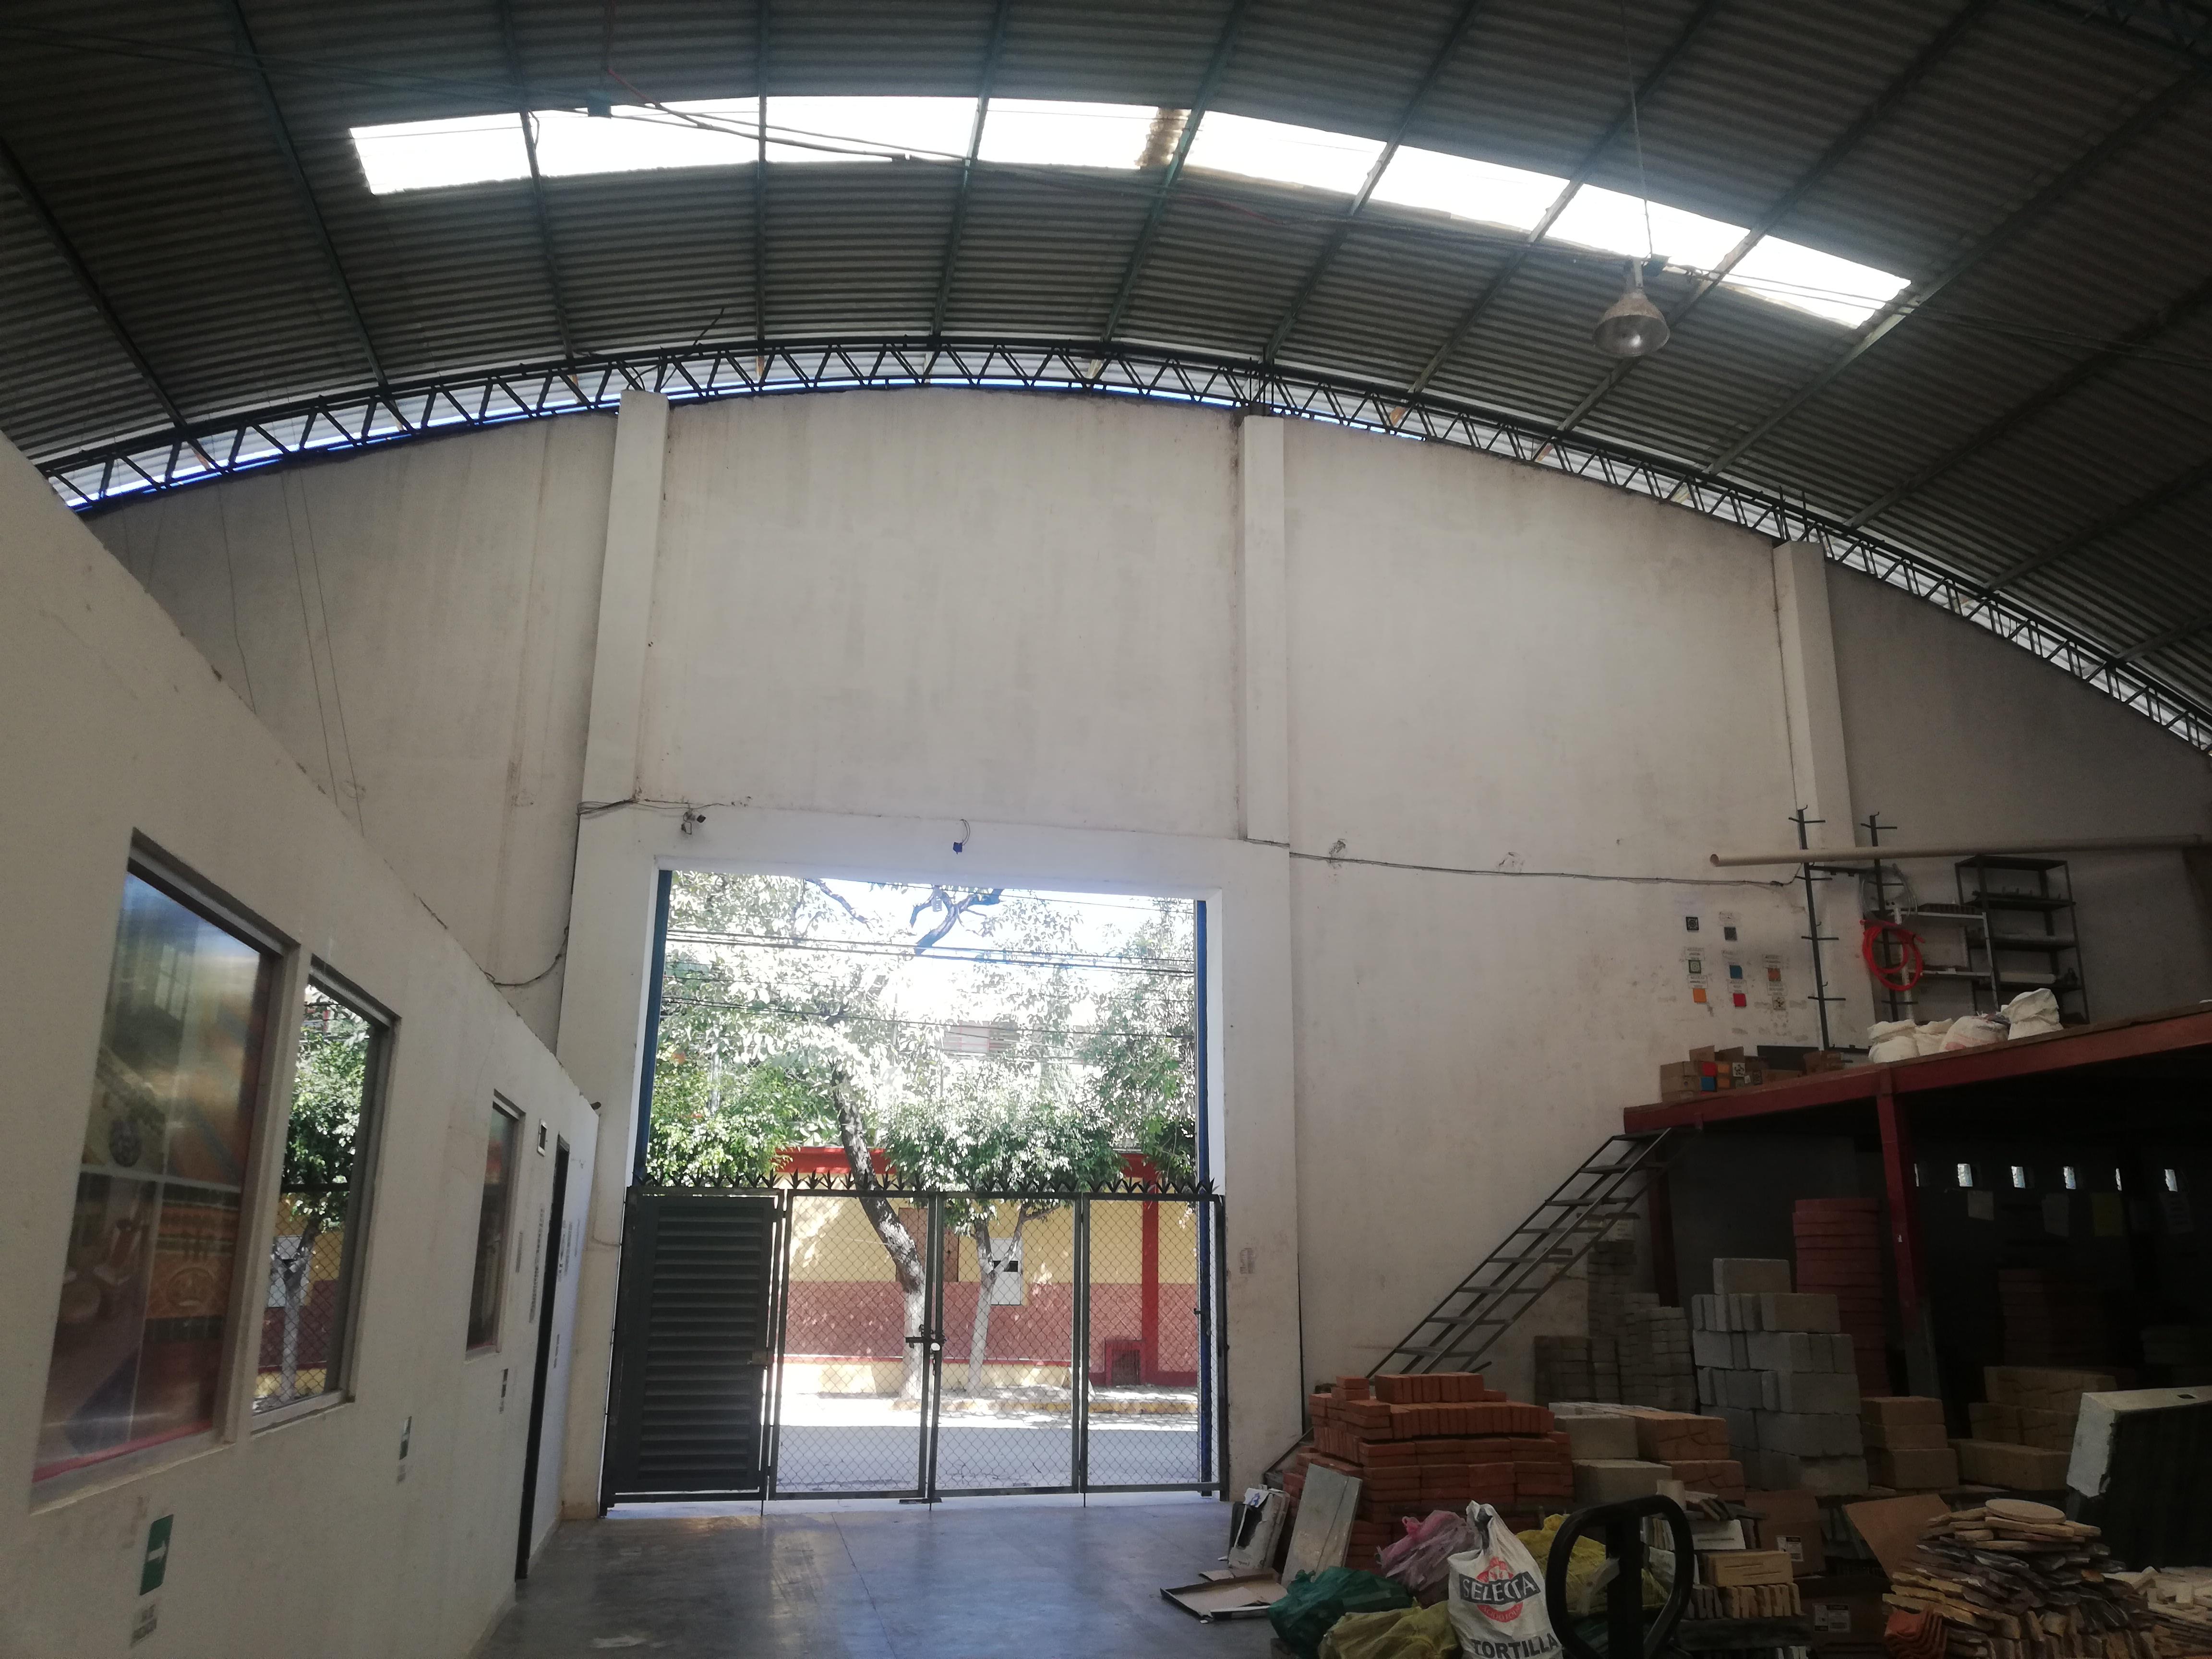 BODEGA CENTRICA EN RENTA EN HACIENDA DE MEXICO, TUXTLA GUTIERREZ, CHIAPAS